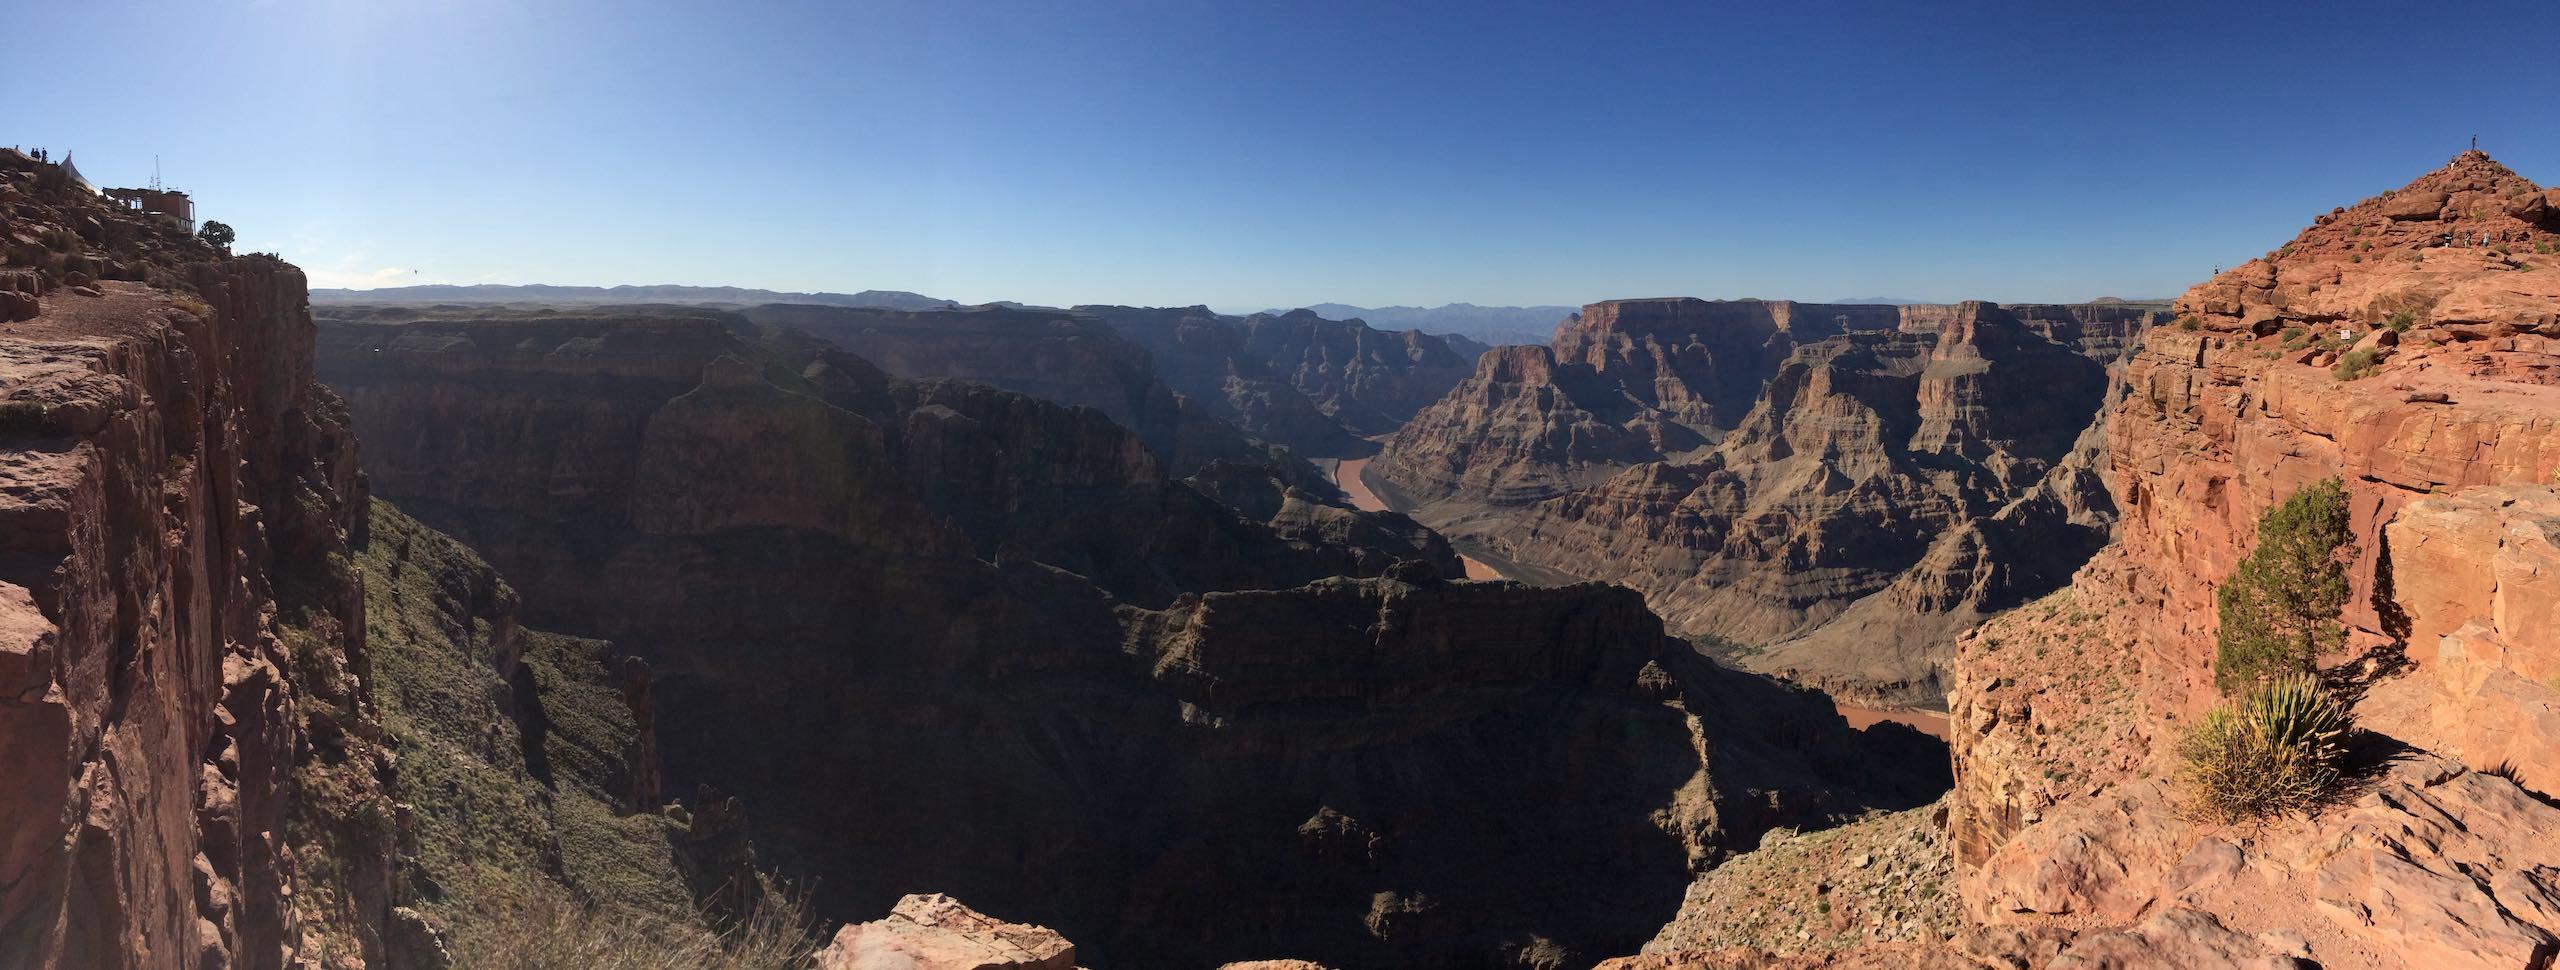 Gran Canyon | Photo: Yasmina Rodríguez